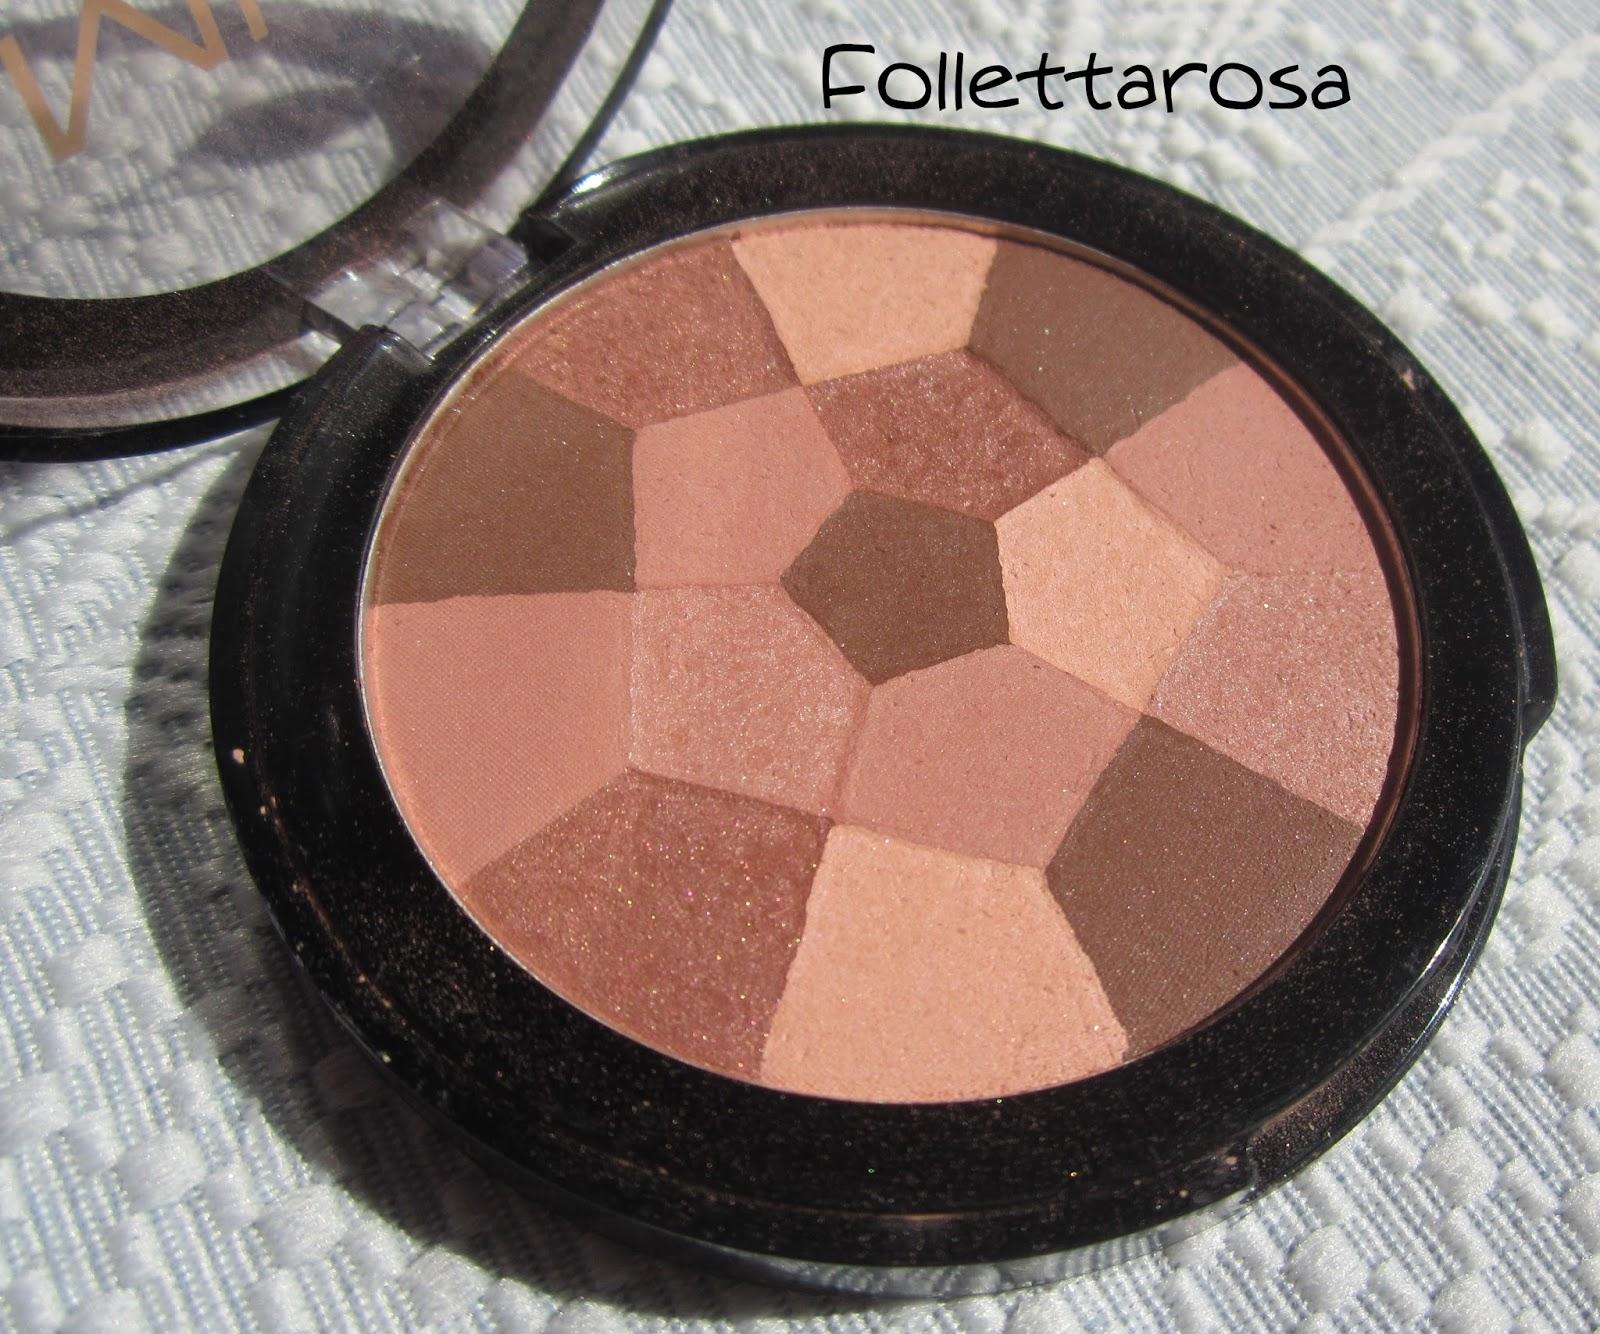 mosaic bronzer makeup academy opinione